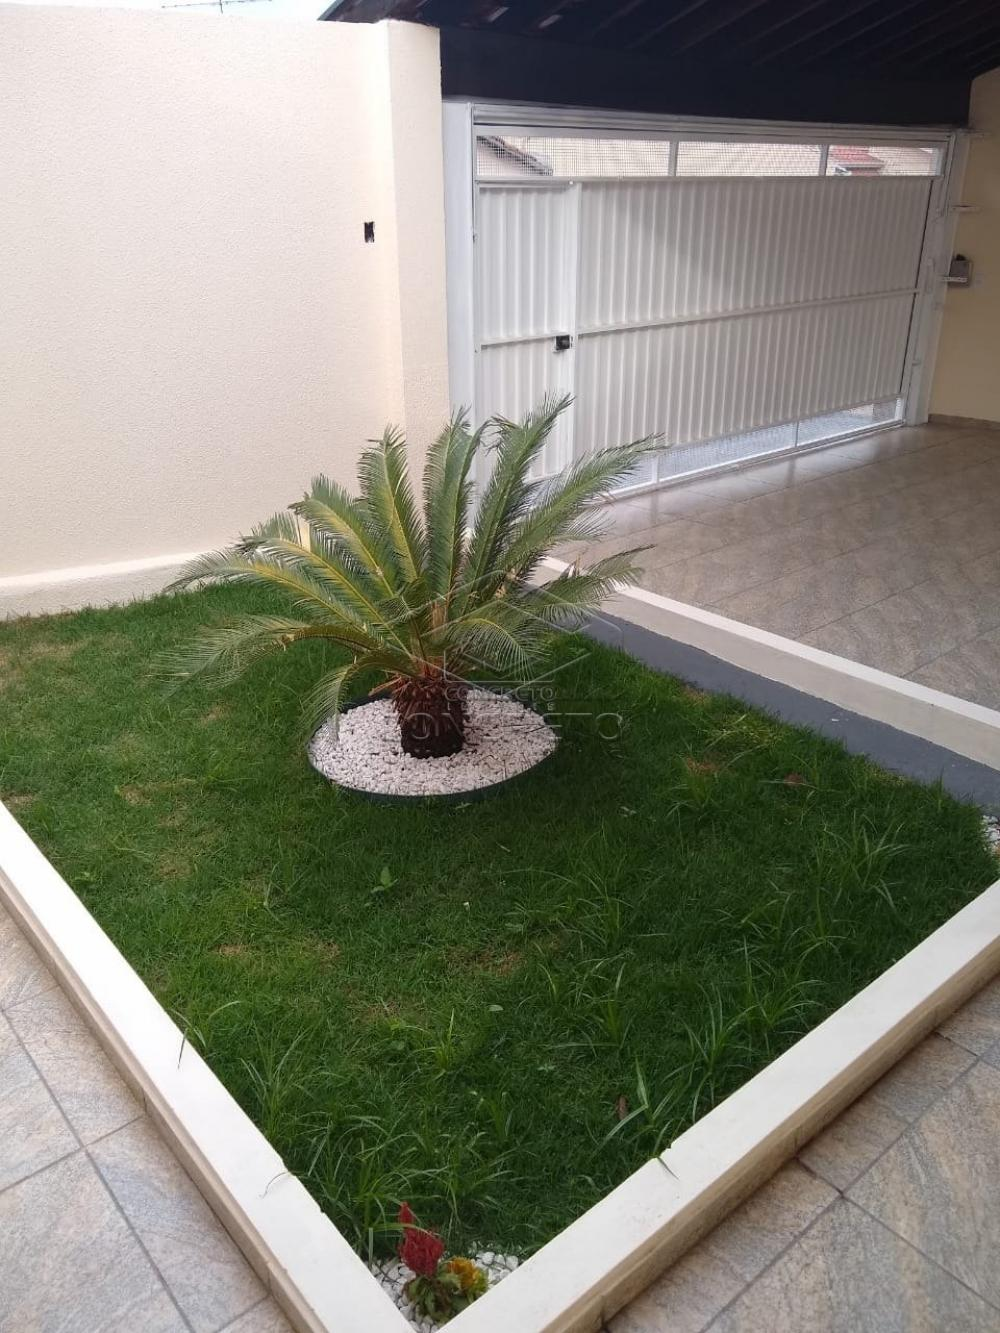 Comprar Casa / Condomínio em Bauru R$ 280.000,00 - Foto 9